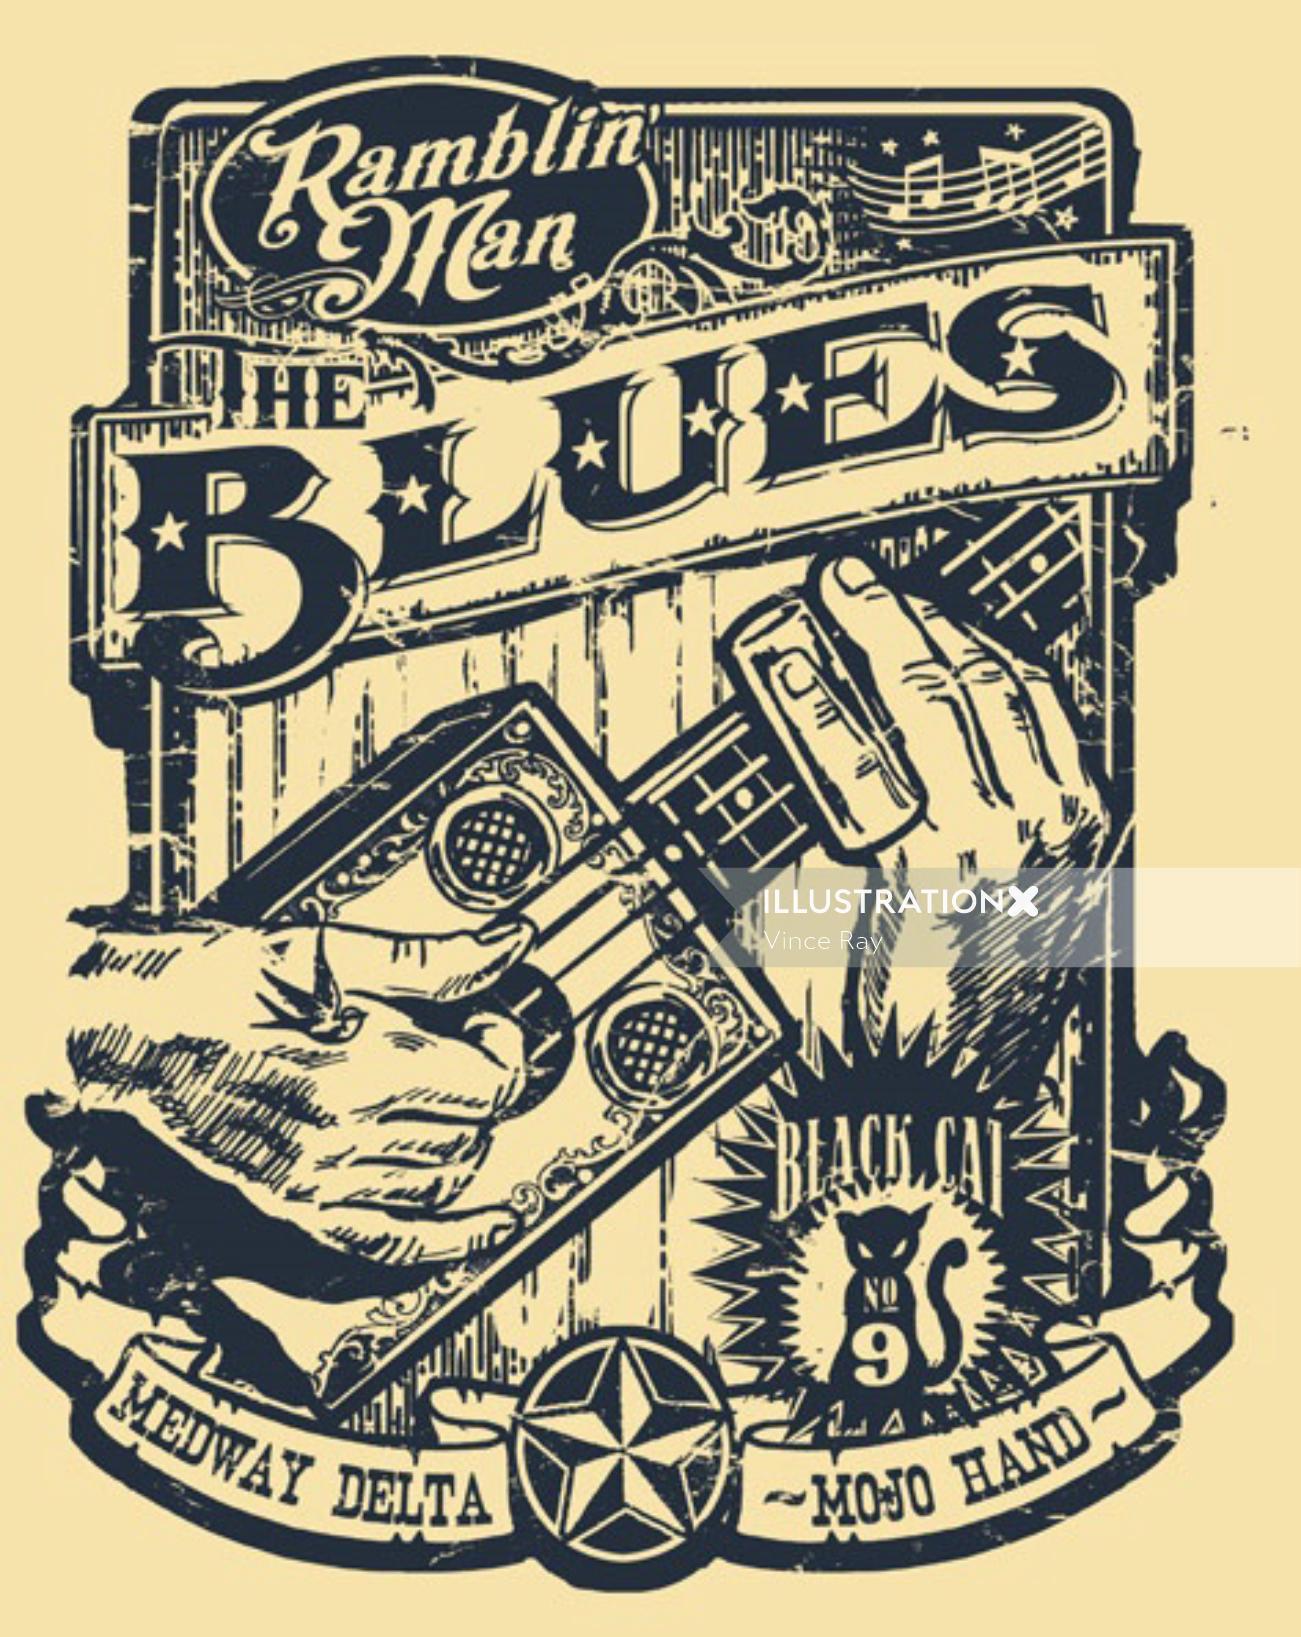 Retro poster design of Ramblin' Man Fair Blues t shirt